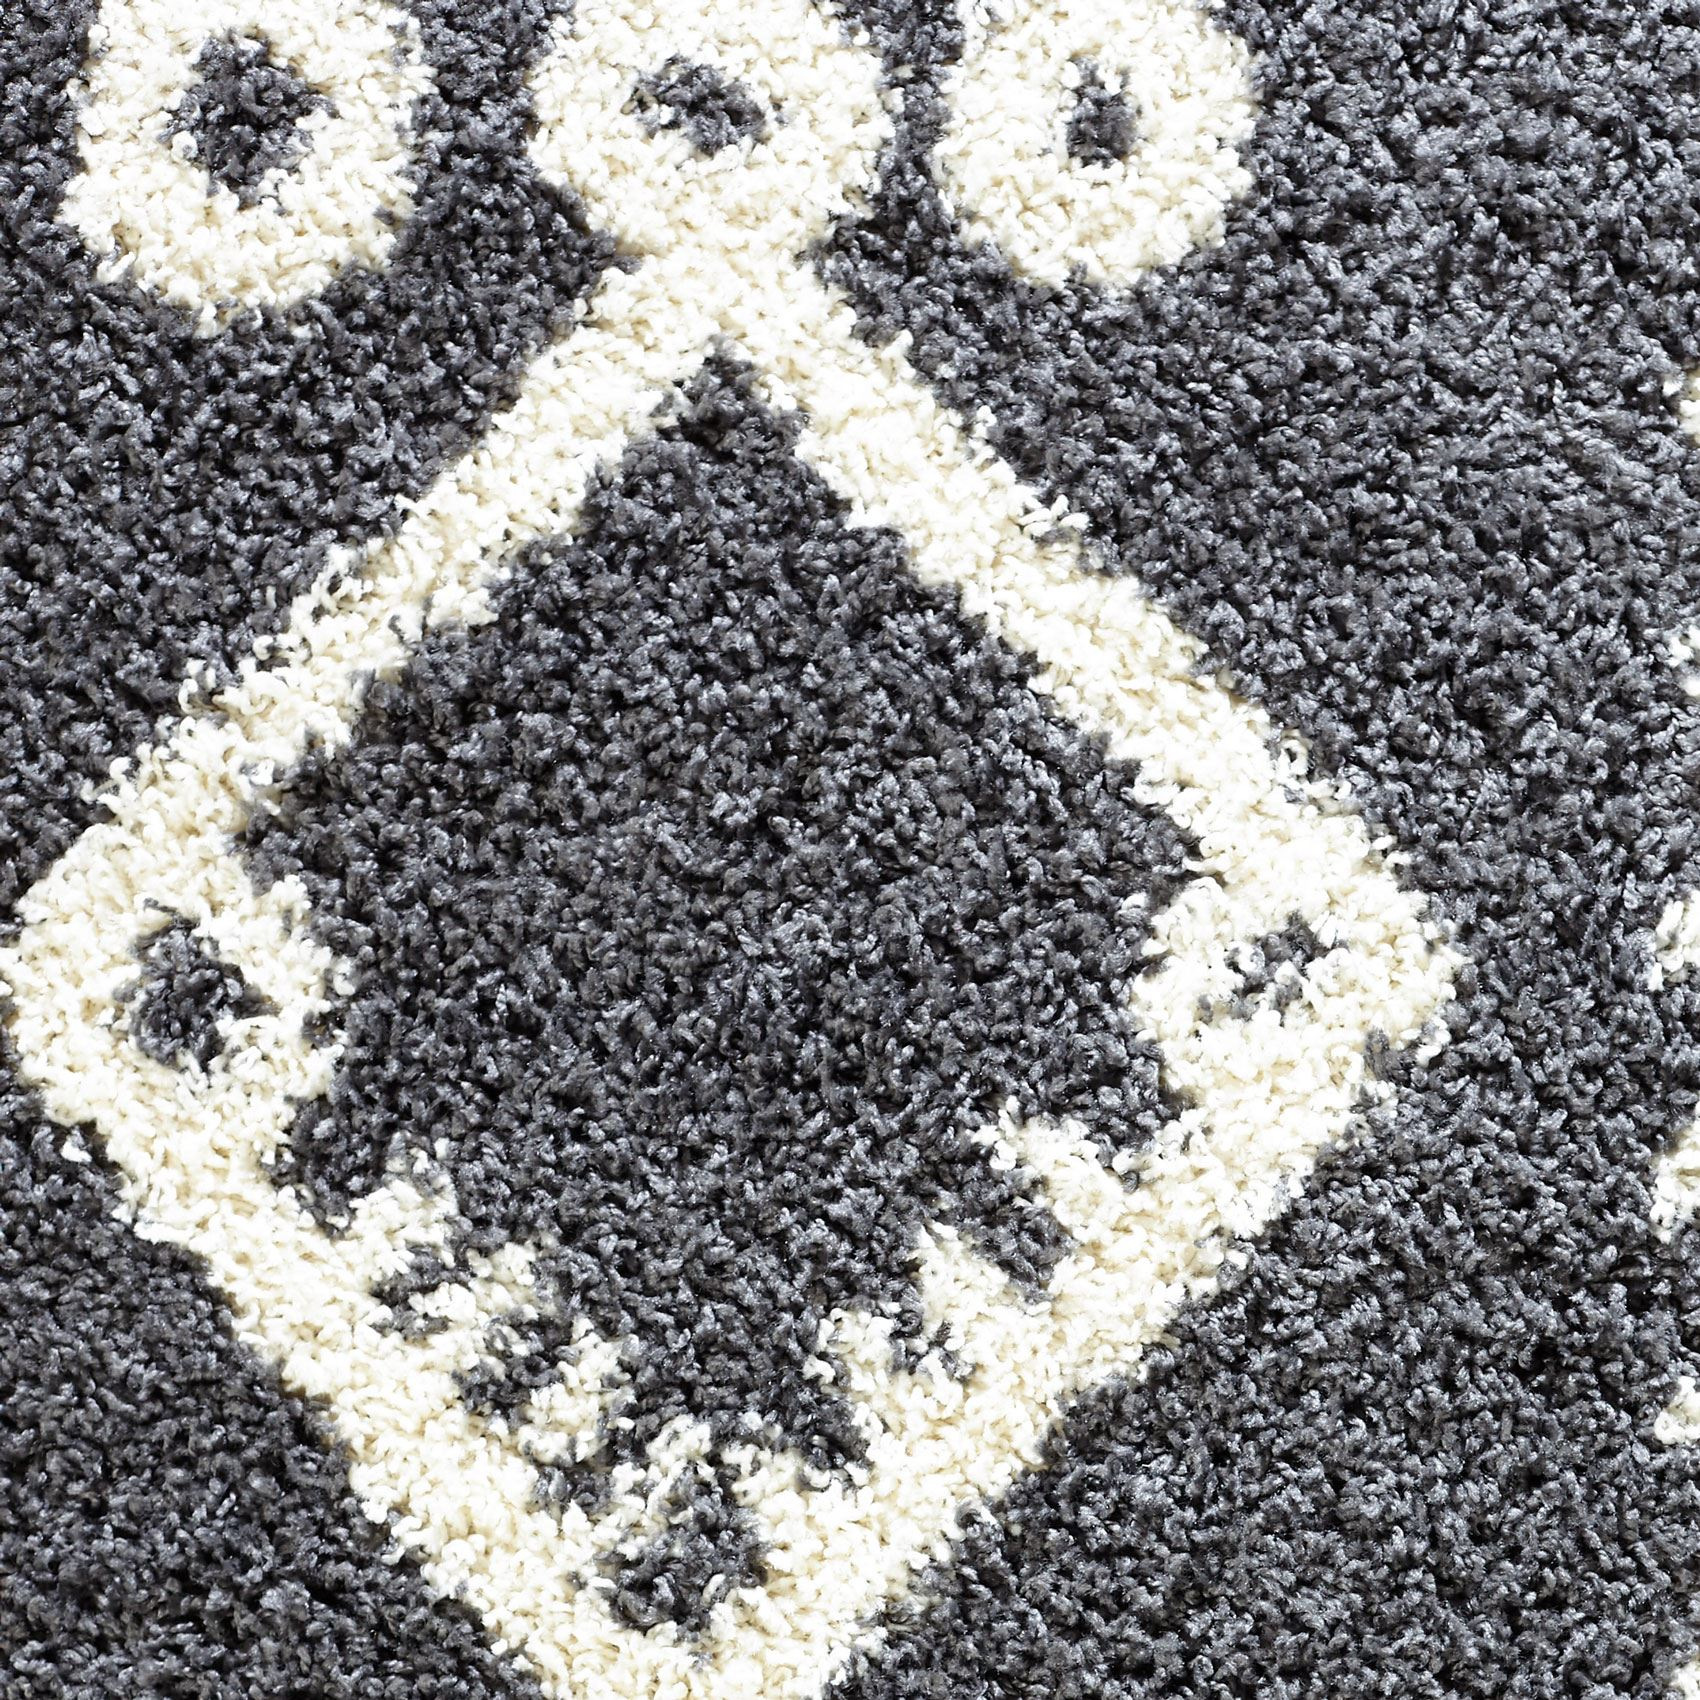 Moroccan-Shaggy-Area-Rug-Grey-White-Black-Soft-Carpet-Traditional-Berber-Designs thumbnail 15